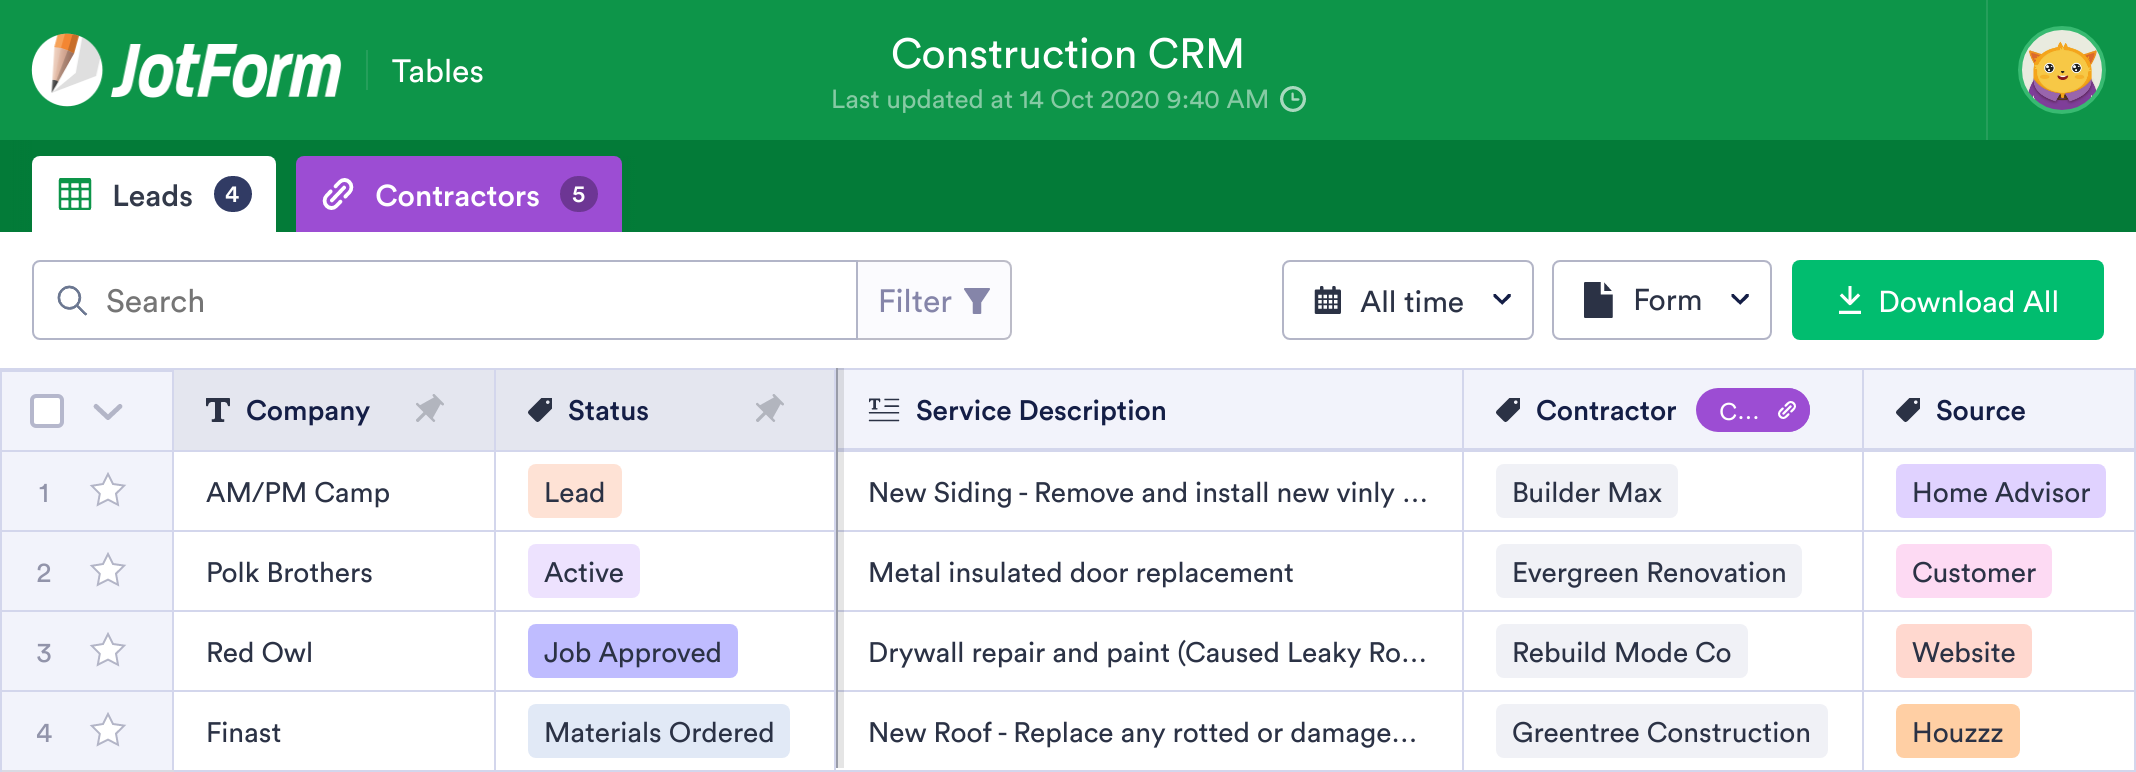 Construction CRM